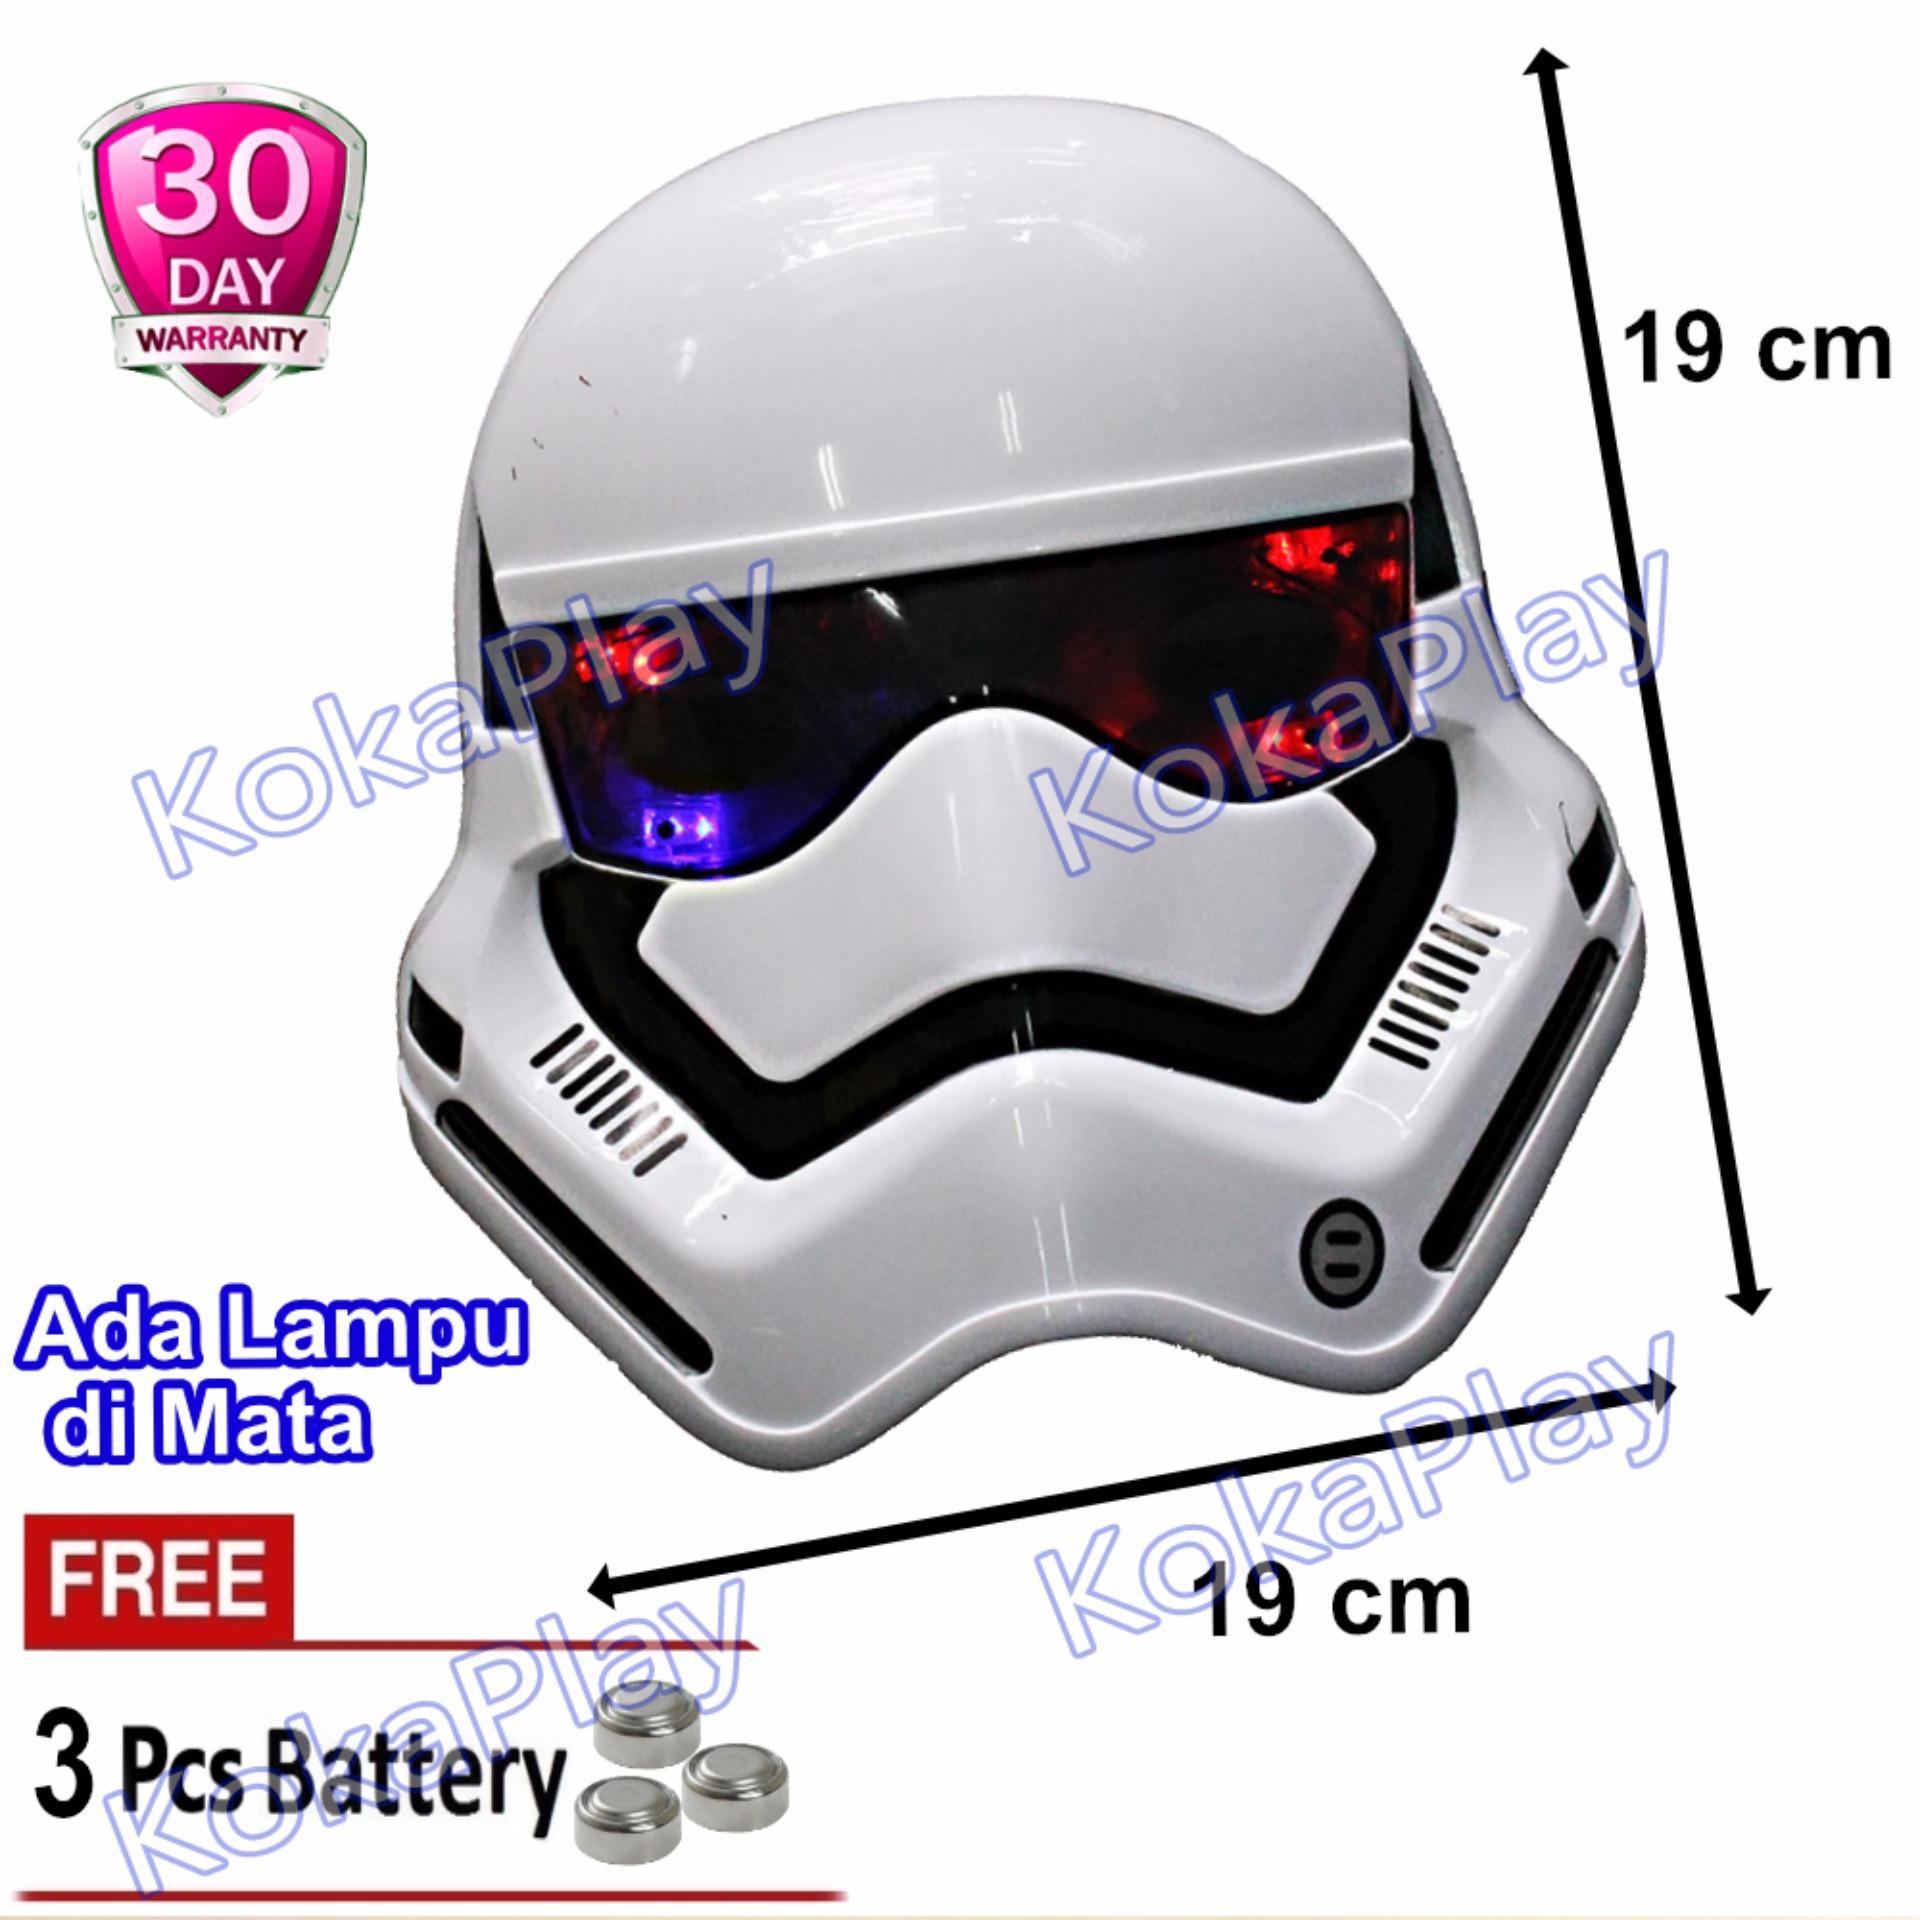 KokaPlay Superhero Mask with Light Mainan Anak Topeng Super Hero Lampu + Free 3 Baterai